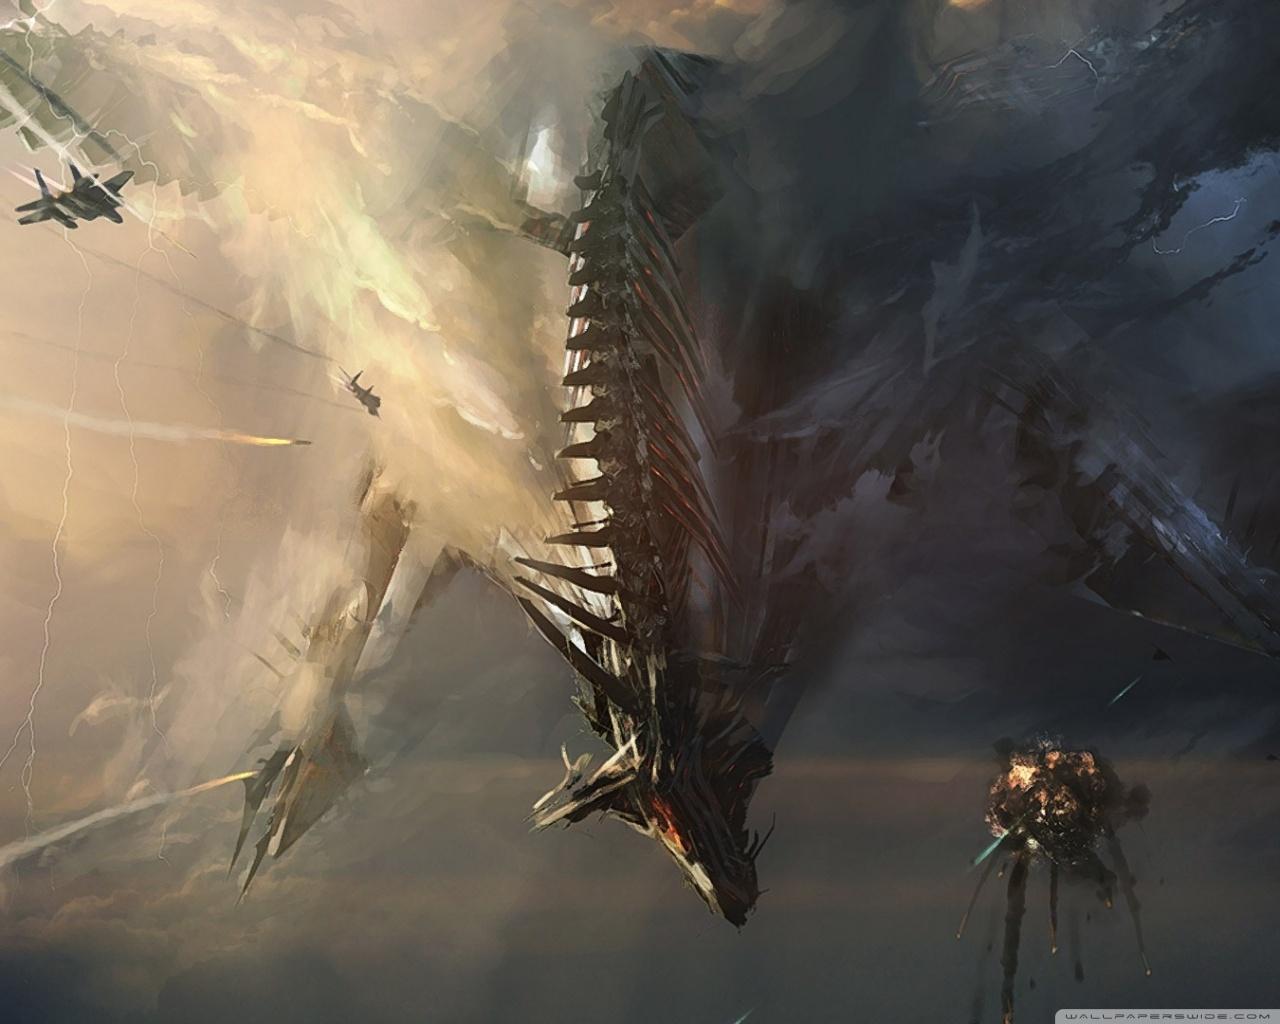 Fall Painting Wallpapers Sci Fi Dragon 4k Hd Desktop Wallpaper For 4k Ultra Hd Tv